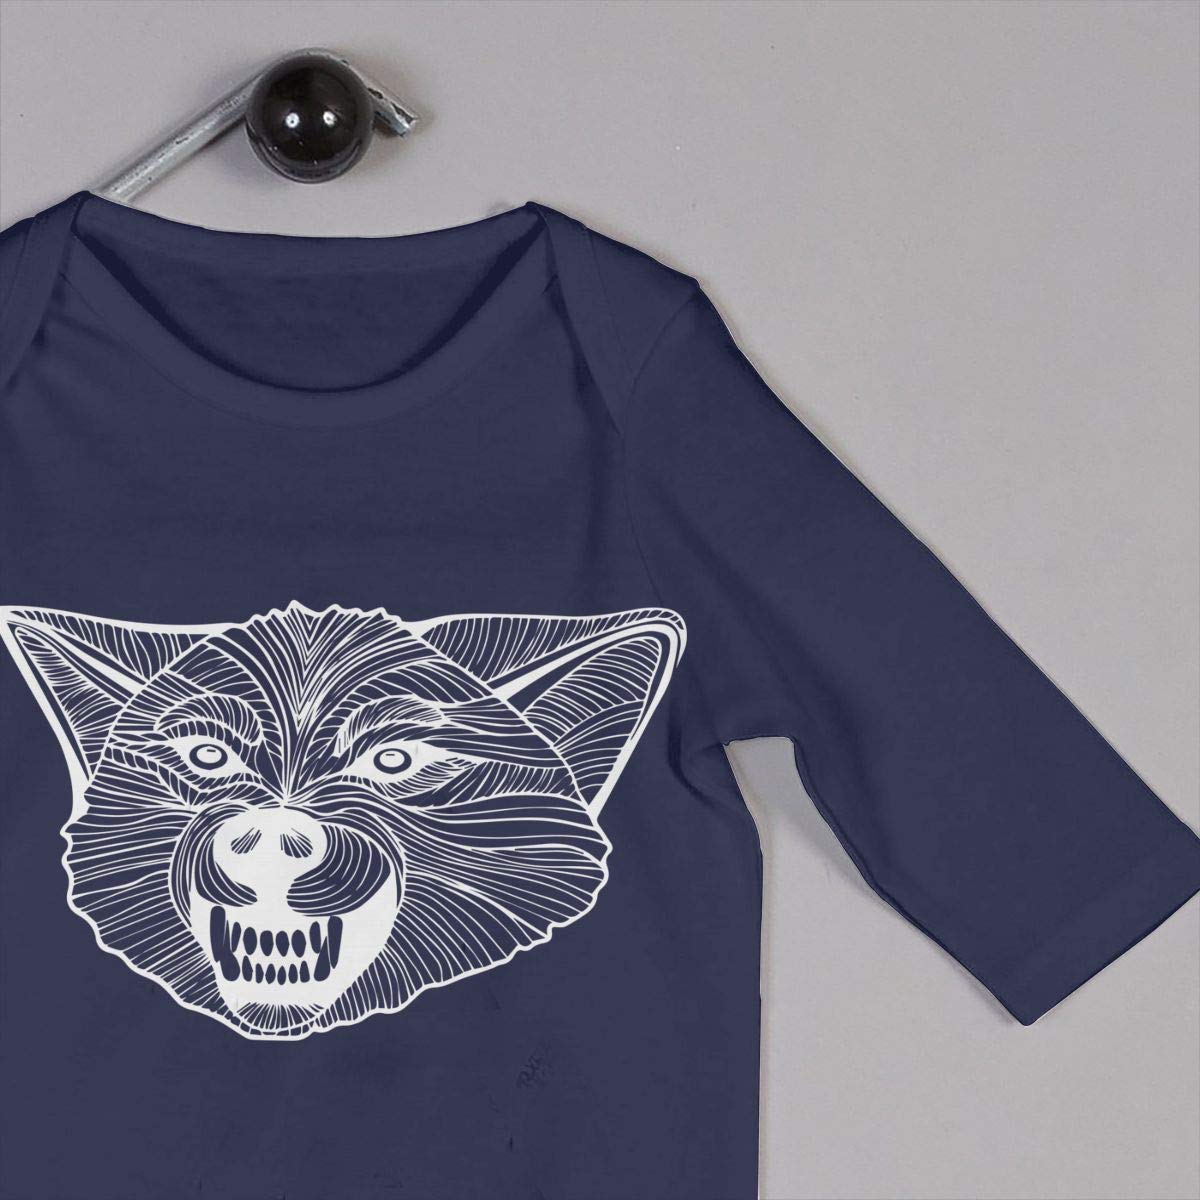 Wild Wolf-1 Newborn Kids Baby Boys Organic Cotton Jumpsuit Overall Romper